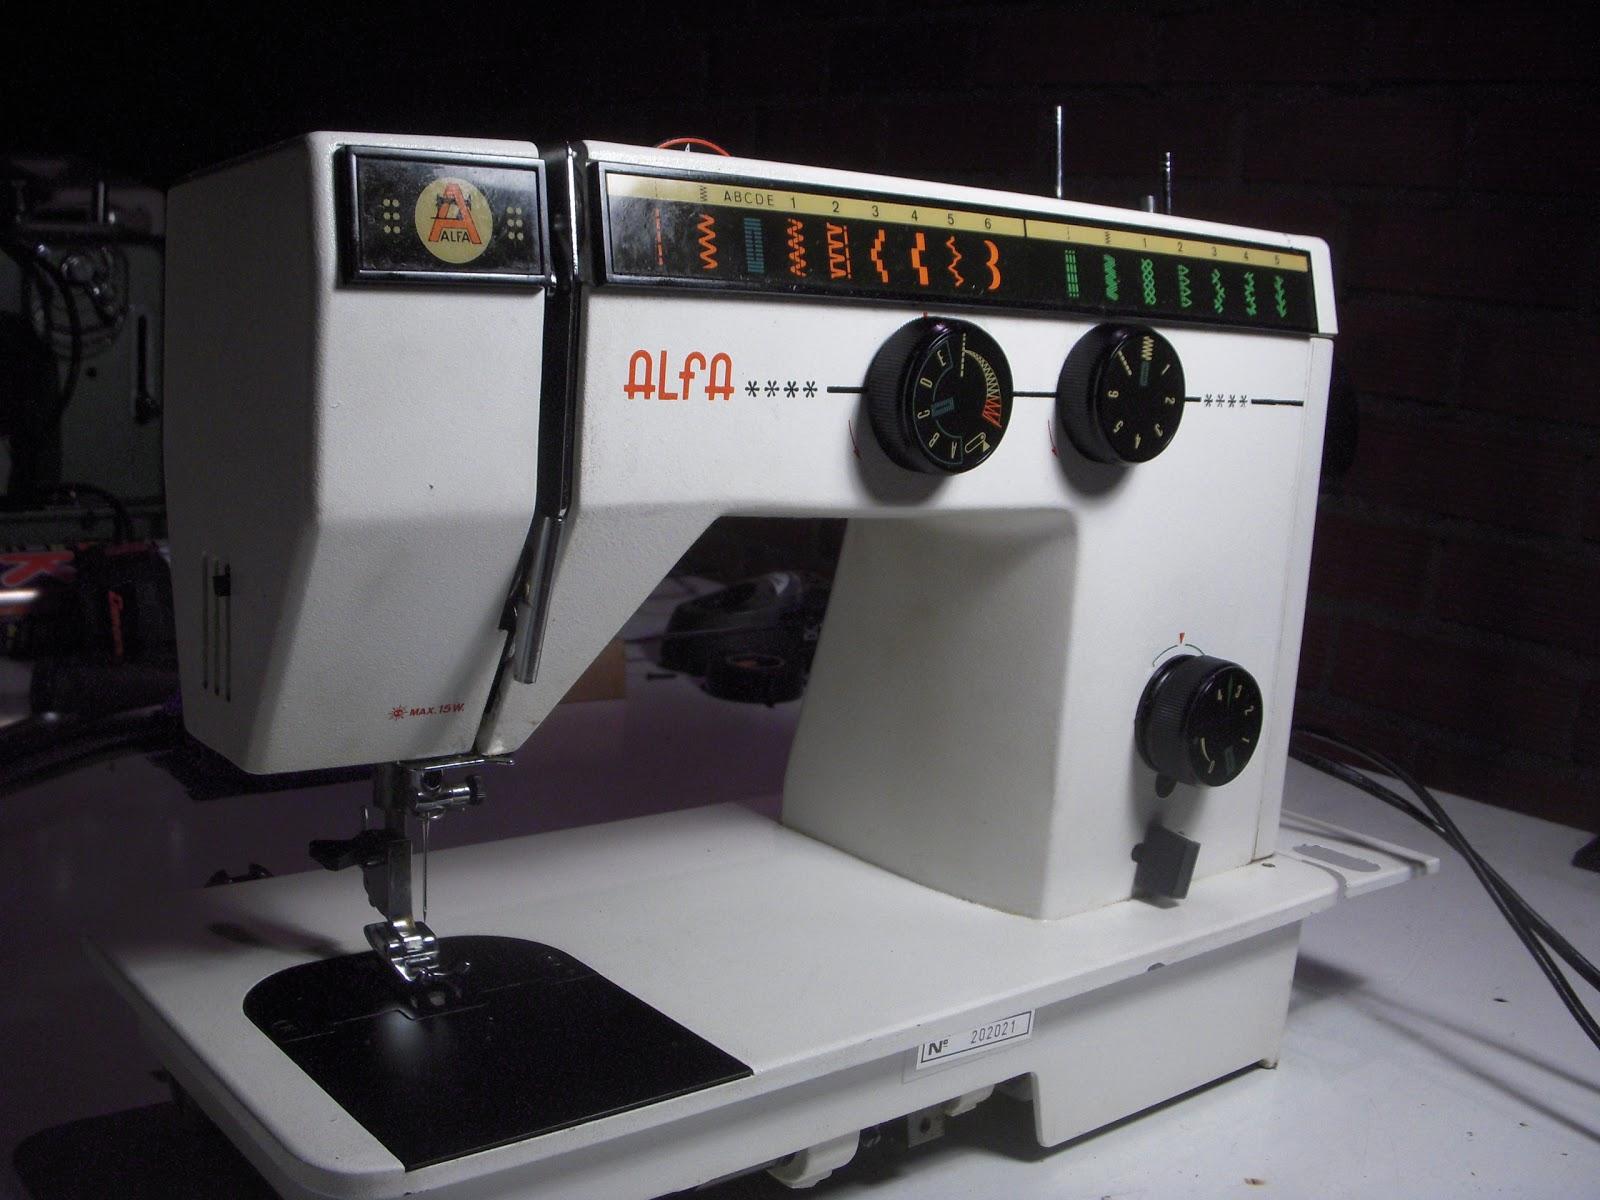 Maquinas de Coser: Ajuste de máquina de coser Alfa domestica